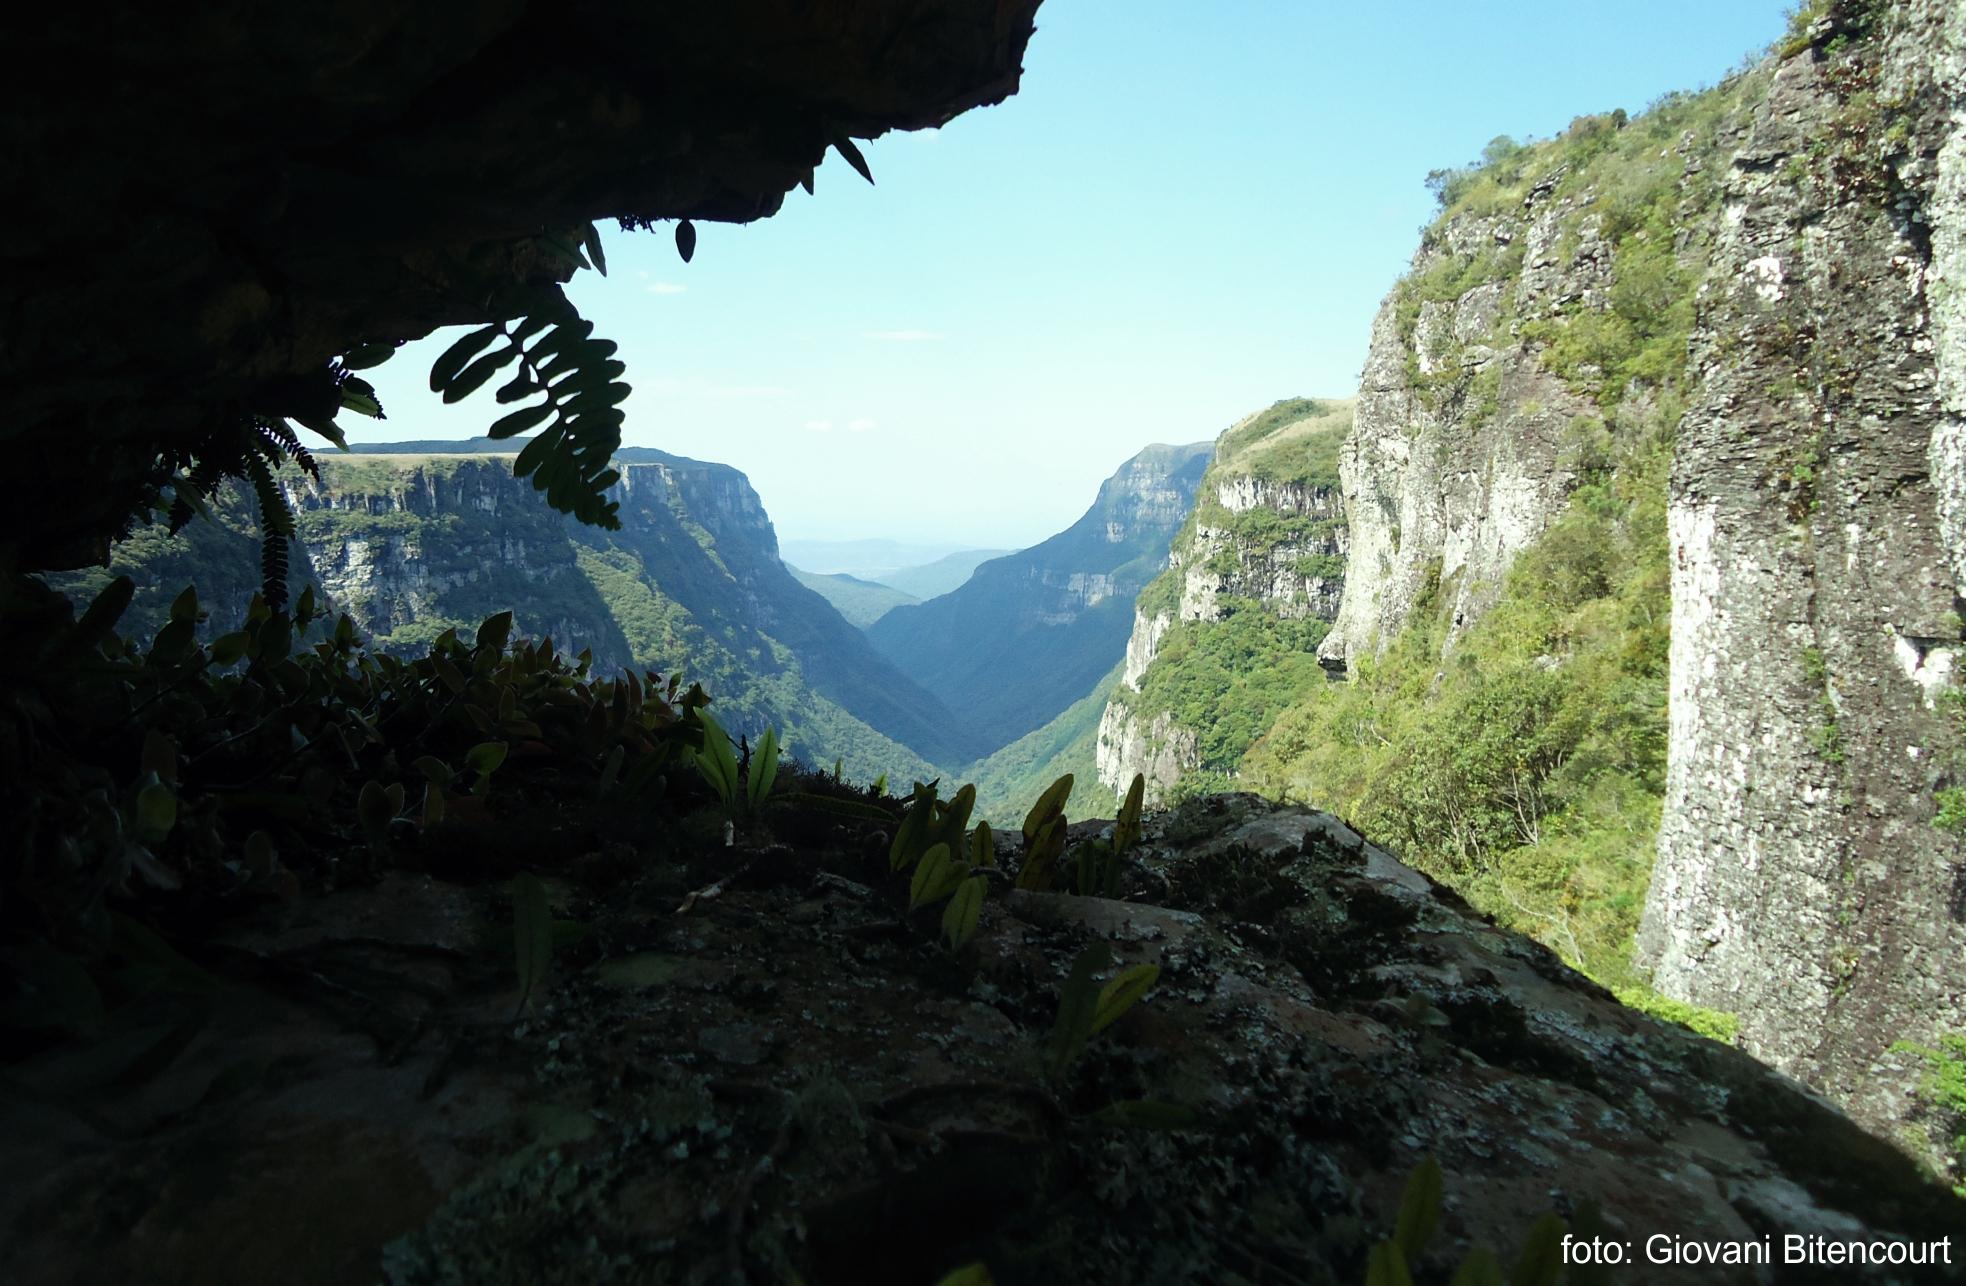 TRILHA DO CANION FORTALEZA 6